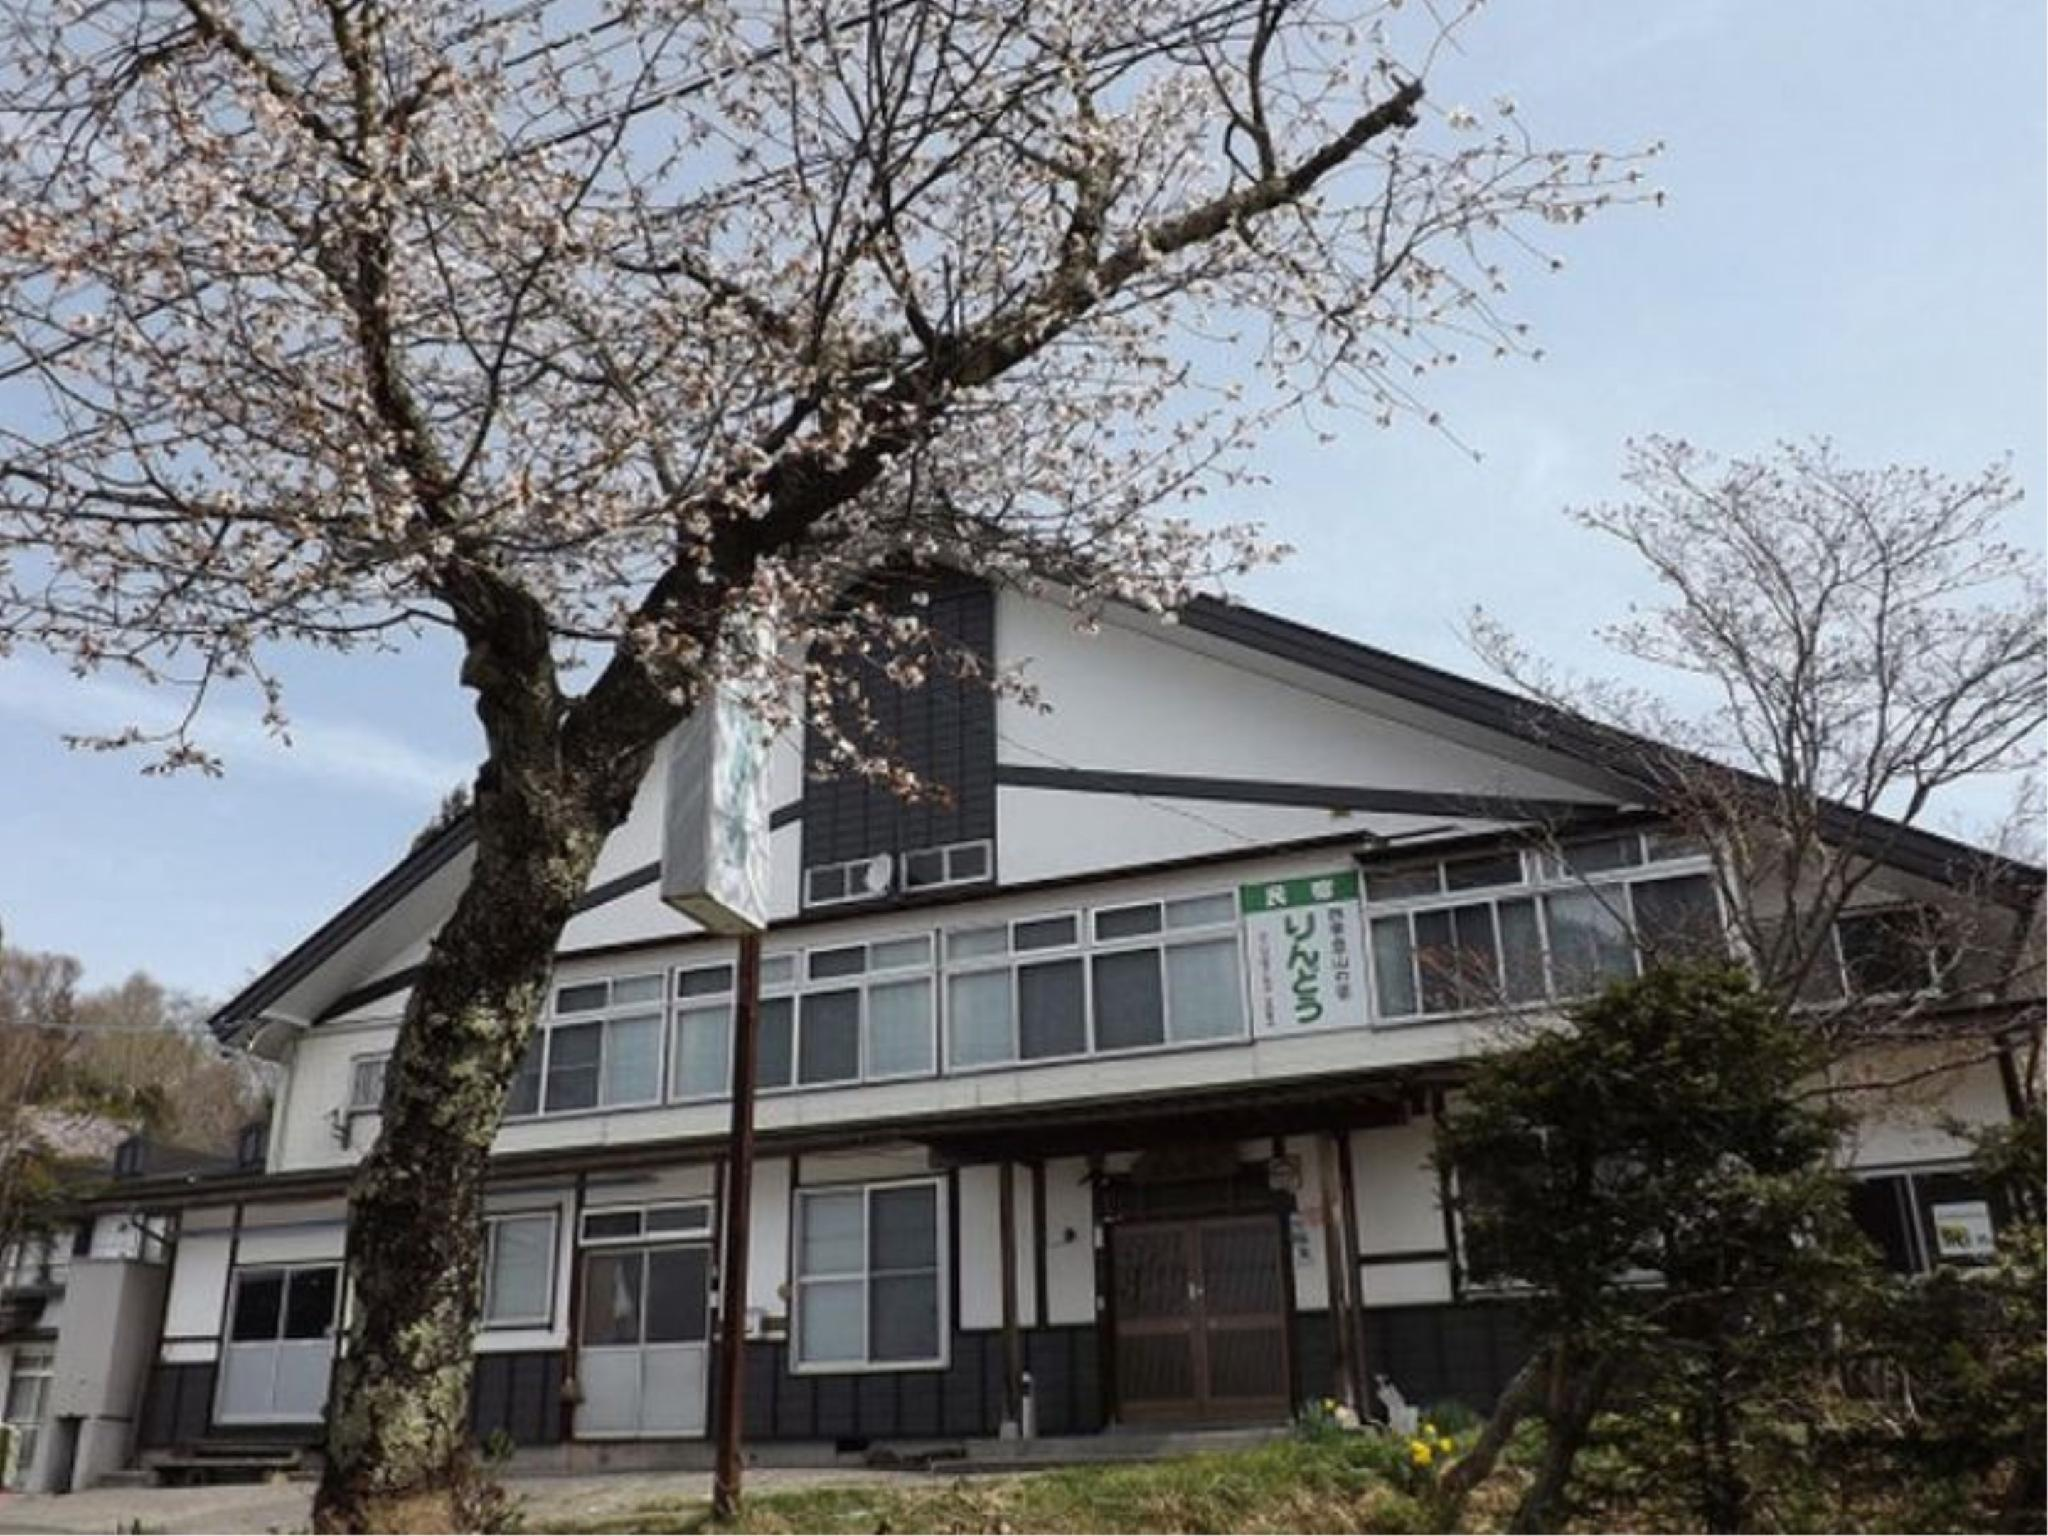 Togakushi Kogen Minshuku Rindou